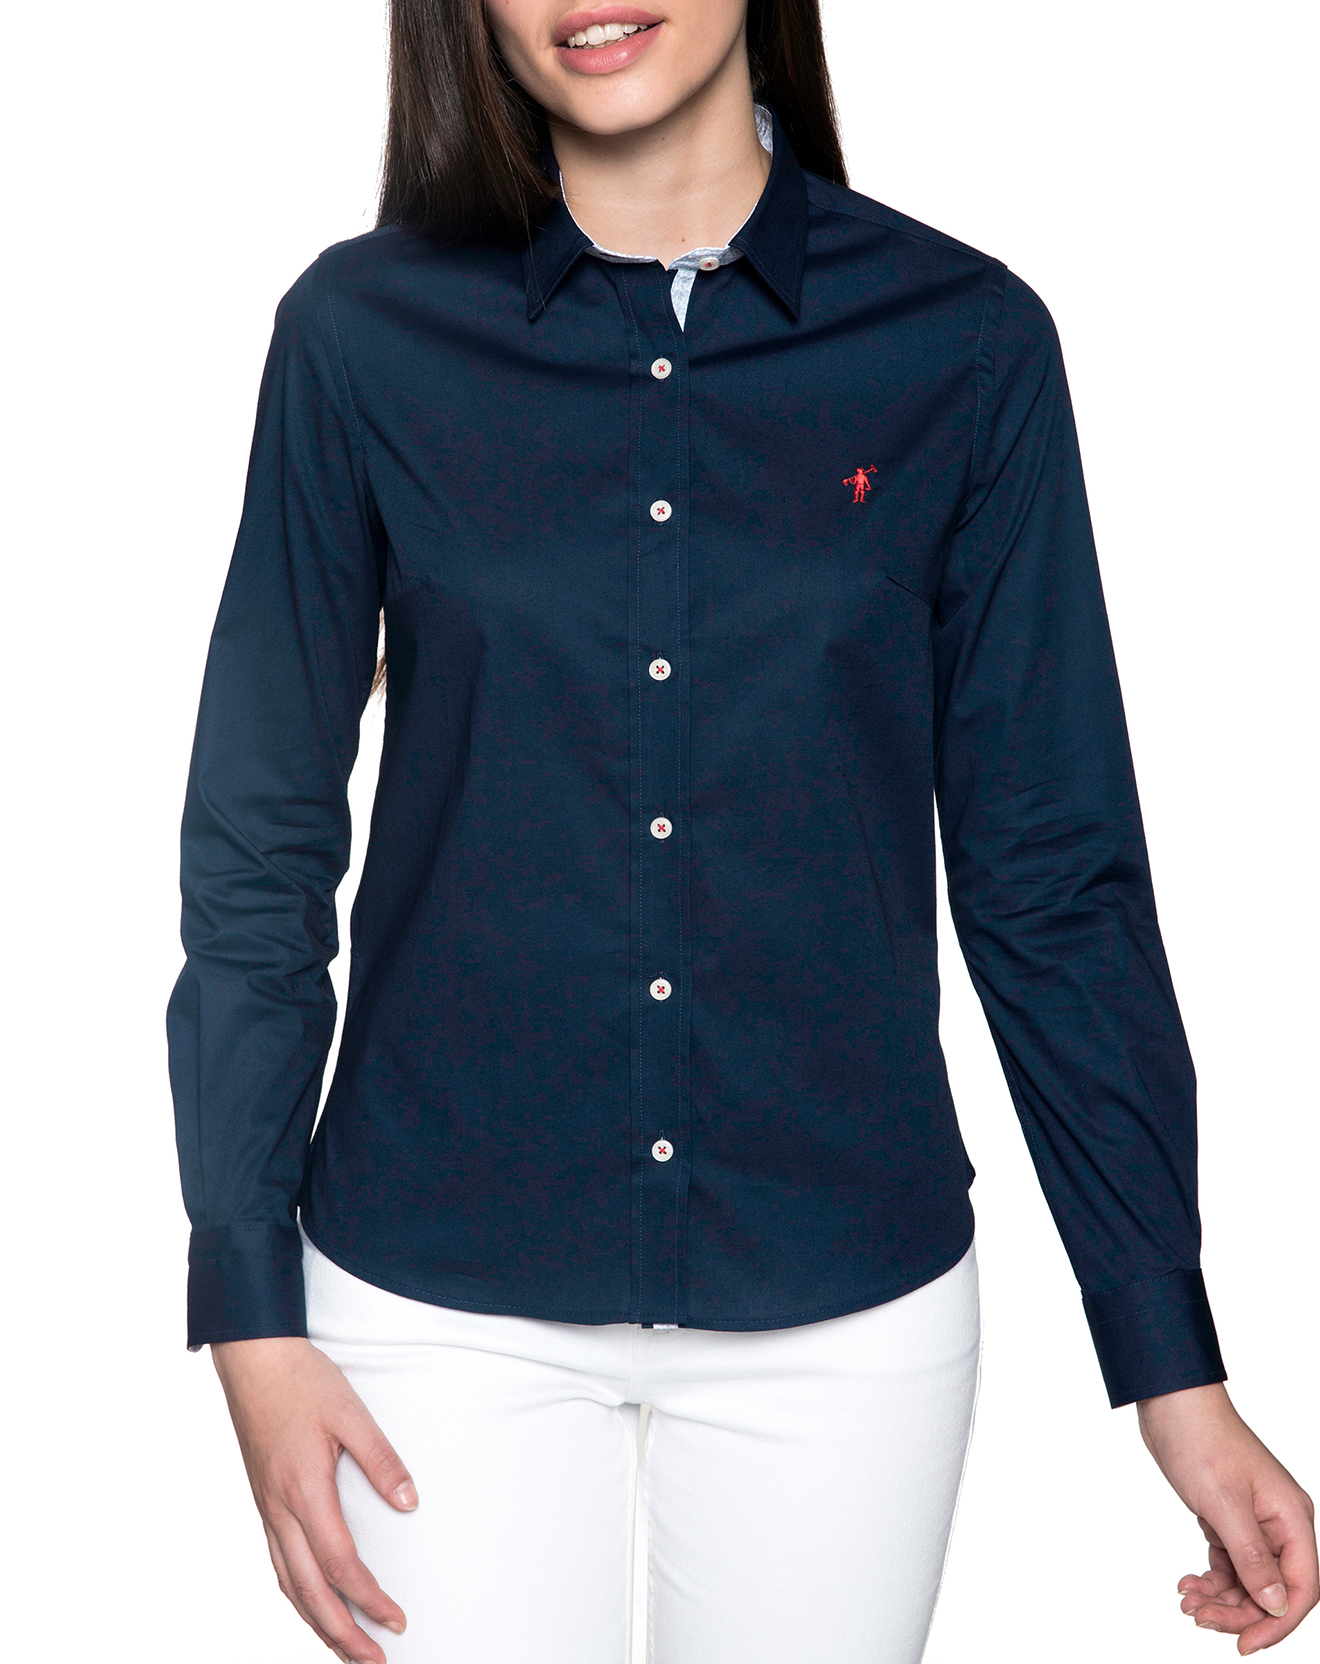 Chemise ajustée avec logo brodé marine